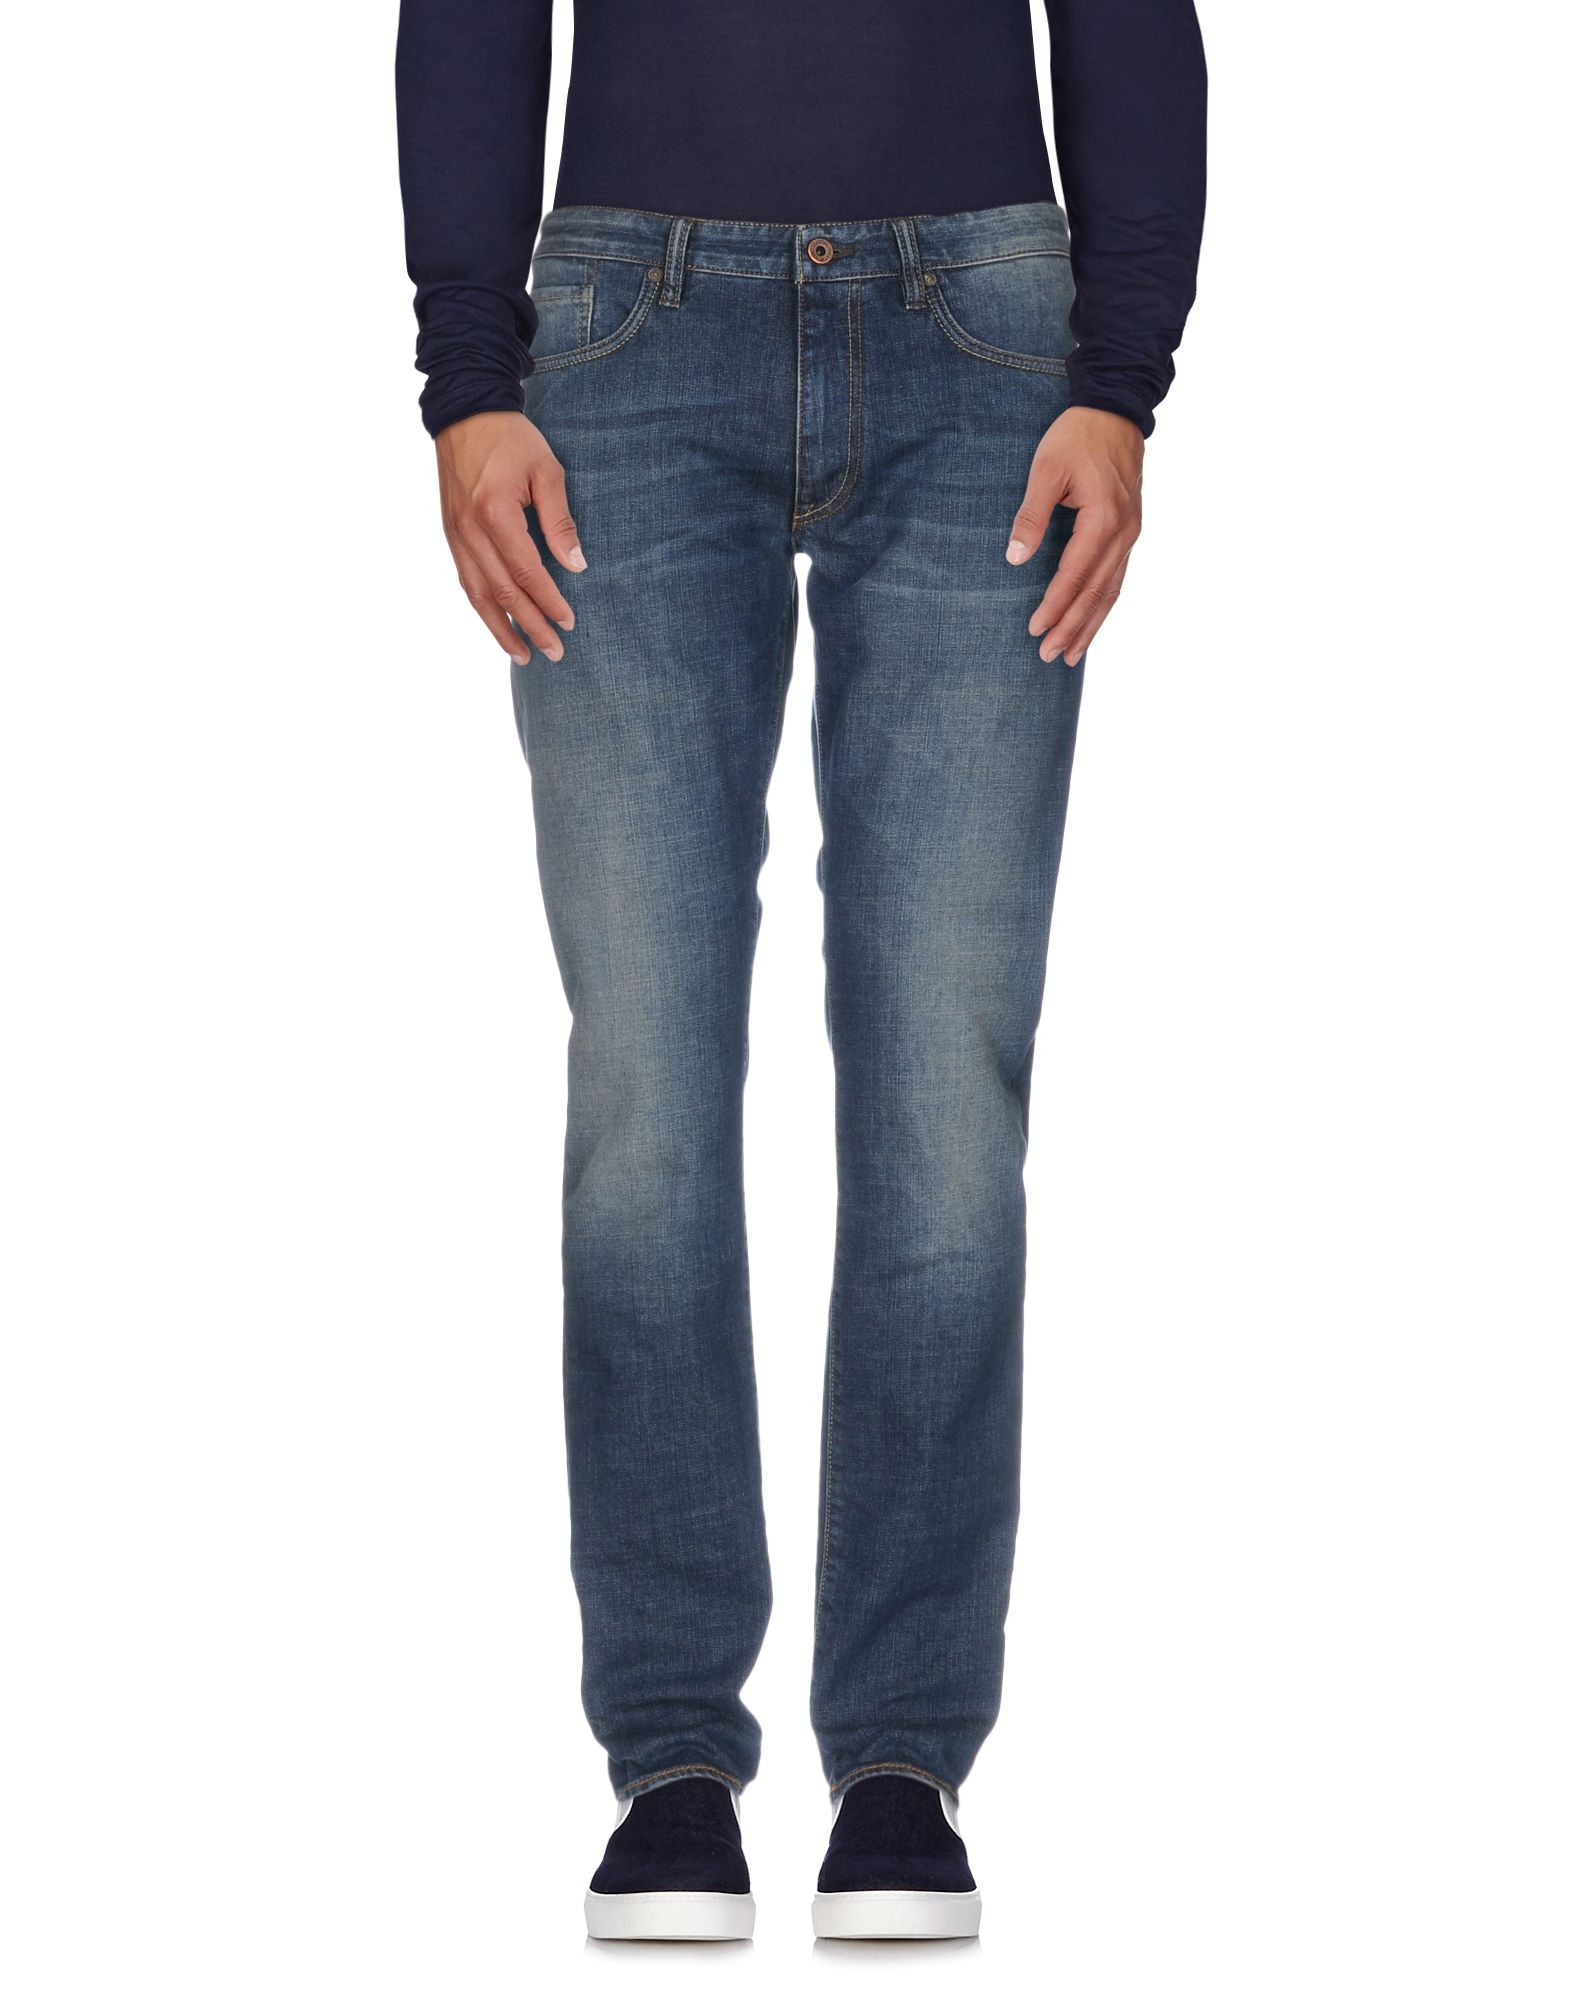 Pantaloni Jeans Uomo Incotex Uomo Jeans - 42501538OR d83005